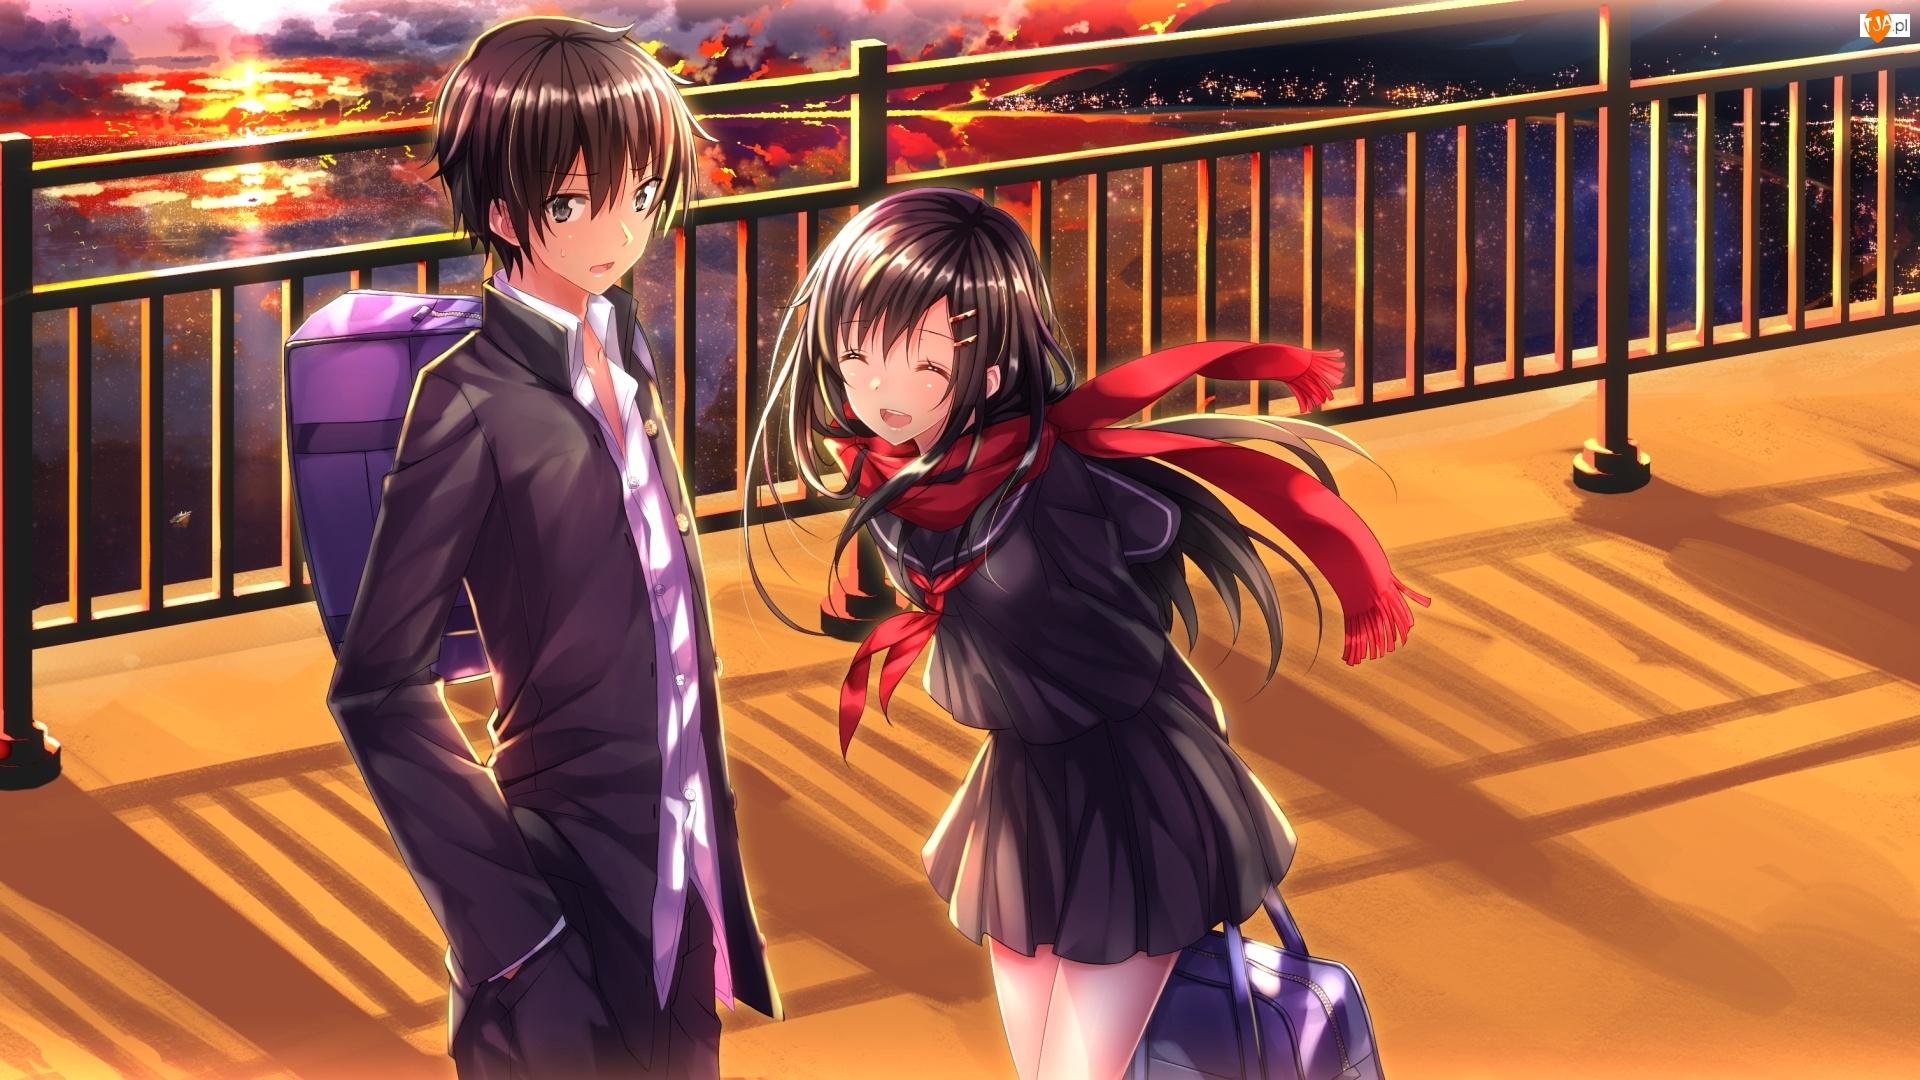 manga, Kagerou Project, Ayano, Shintaro, anime